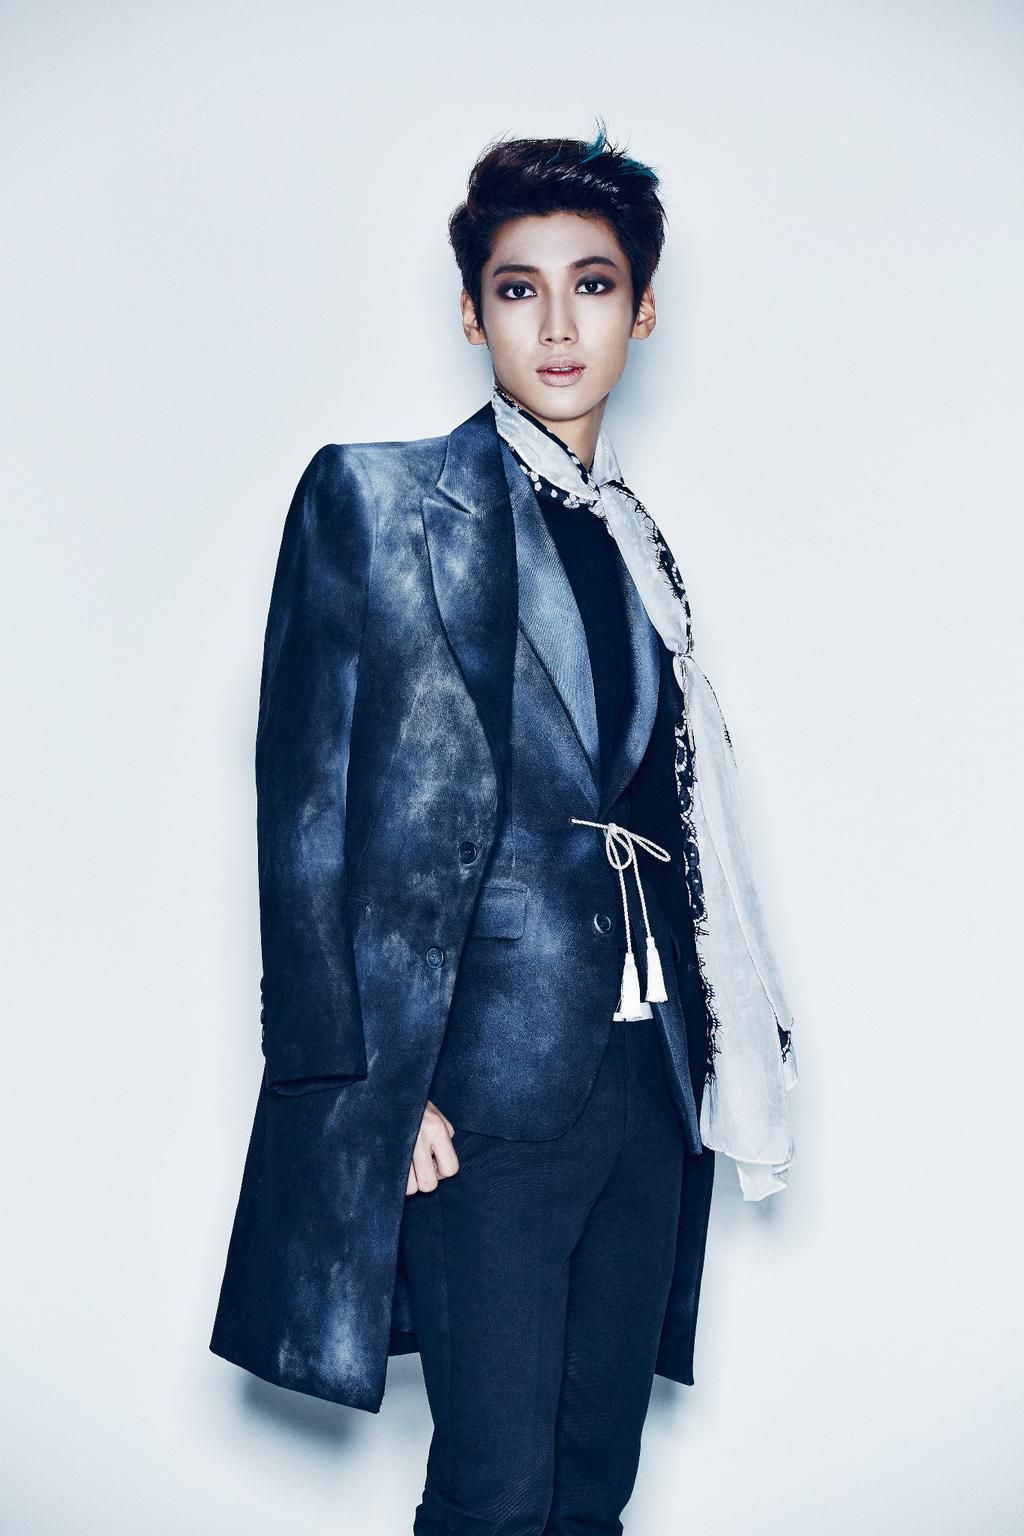 And Kwangmin (광민), the cute younger twin of @G_BoyFriend! #BoyfriendASC